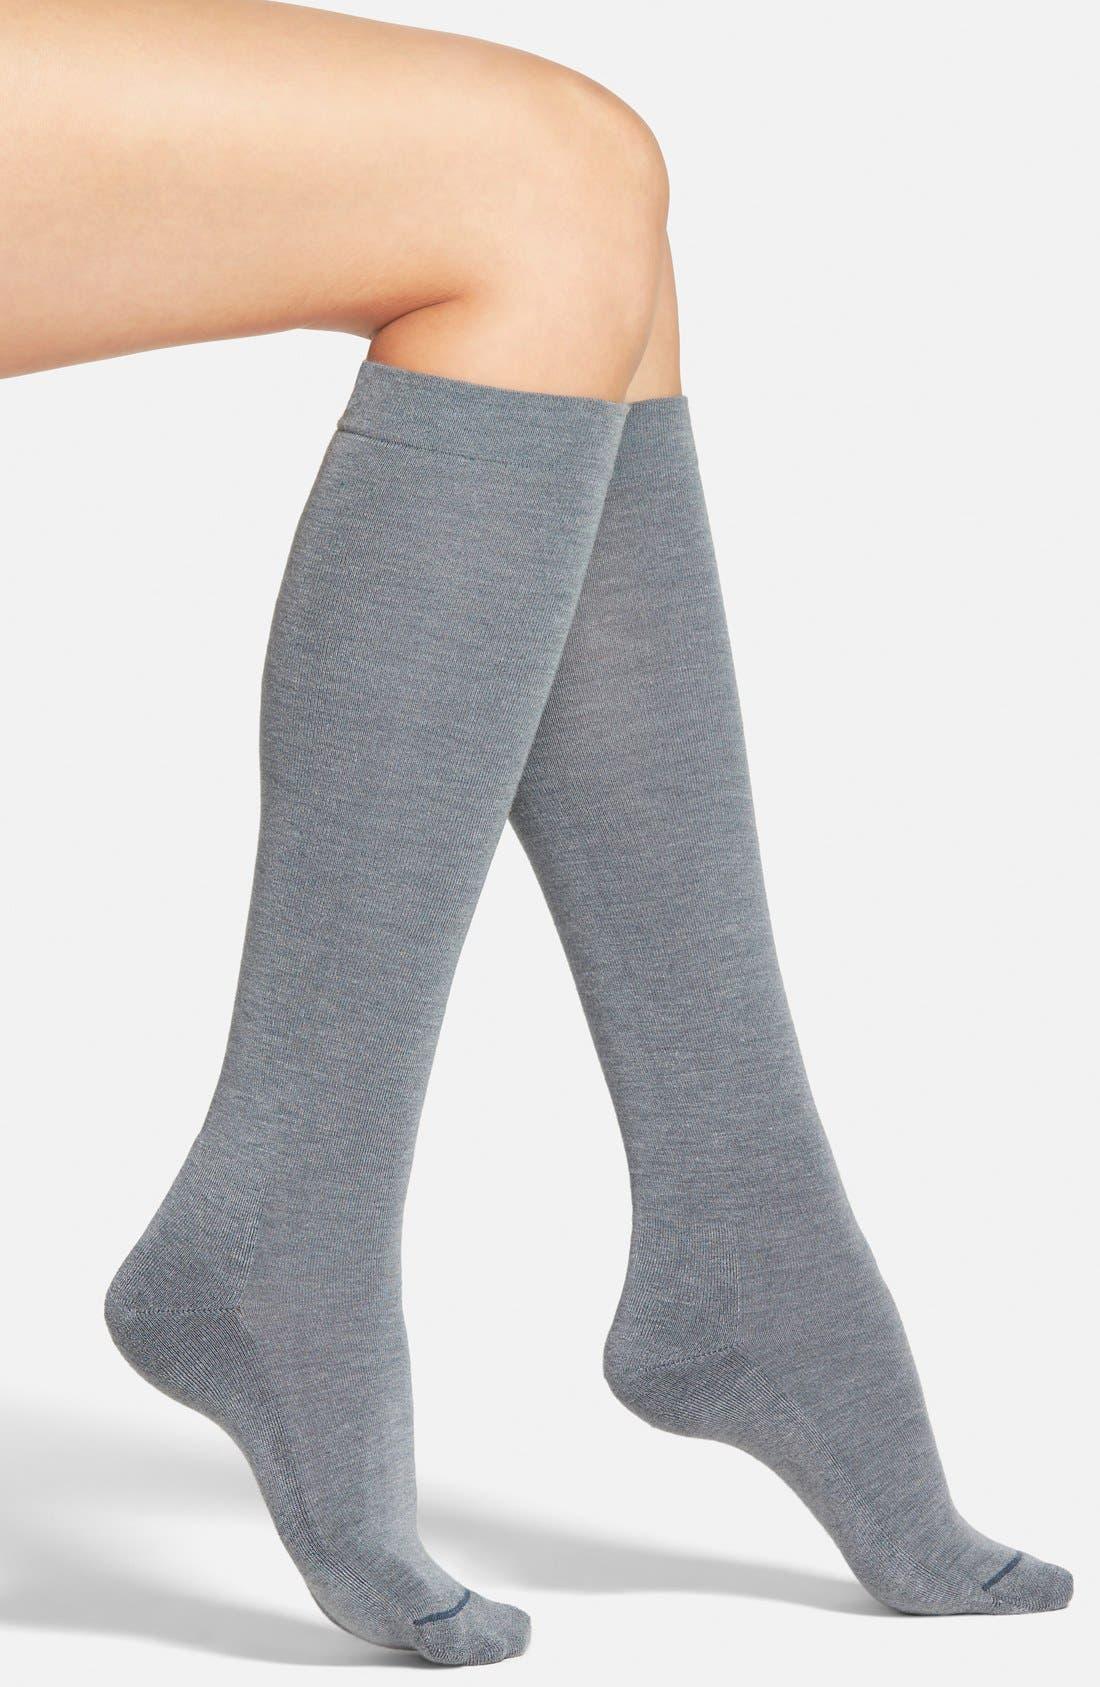 Alternate Image 1 Selected - Hue 'Heat Temp' Warming Knee High Socks